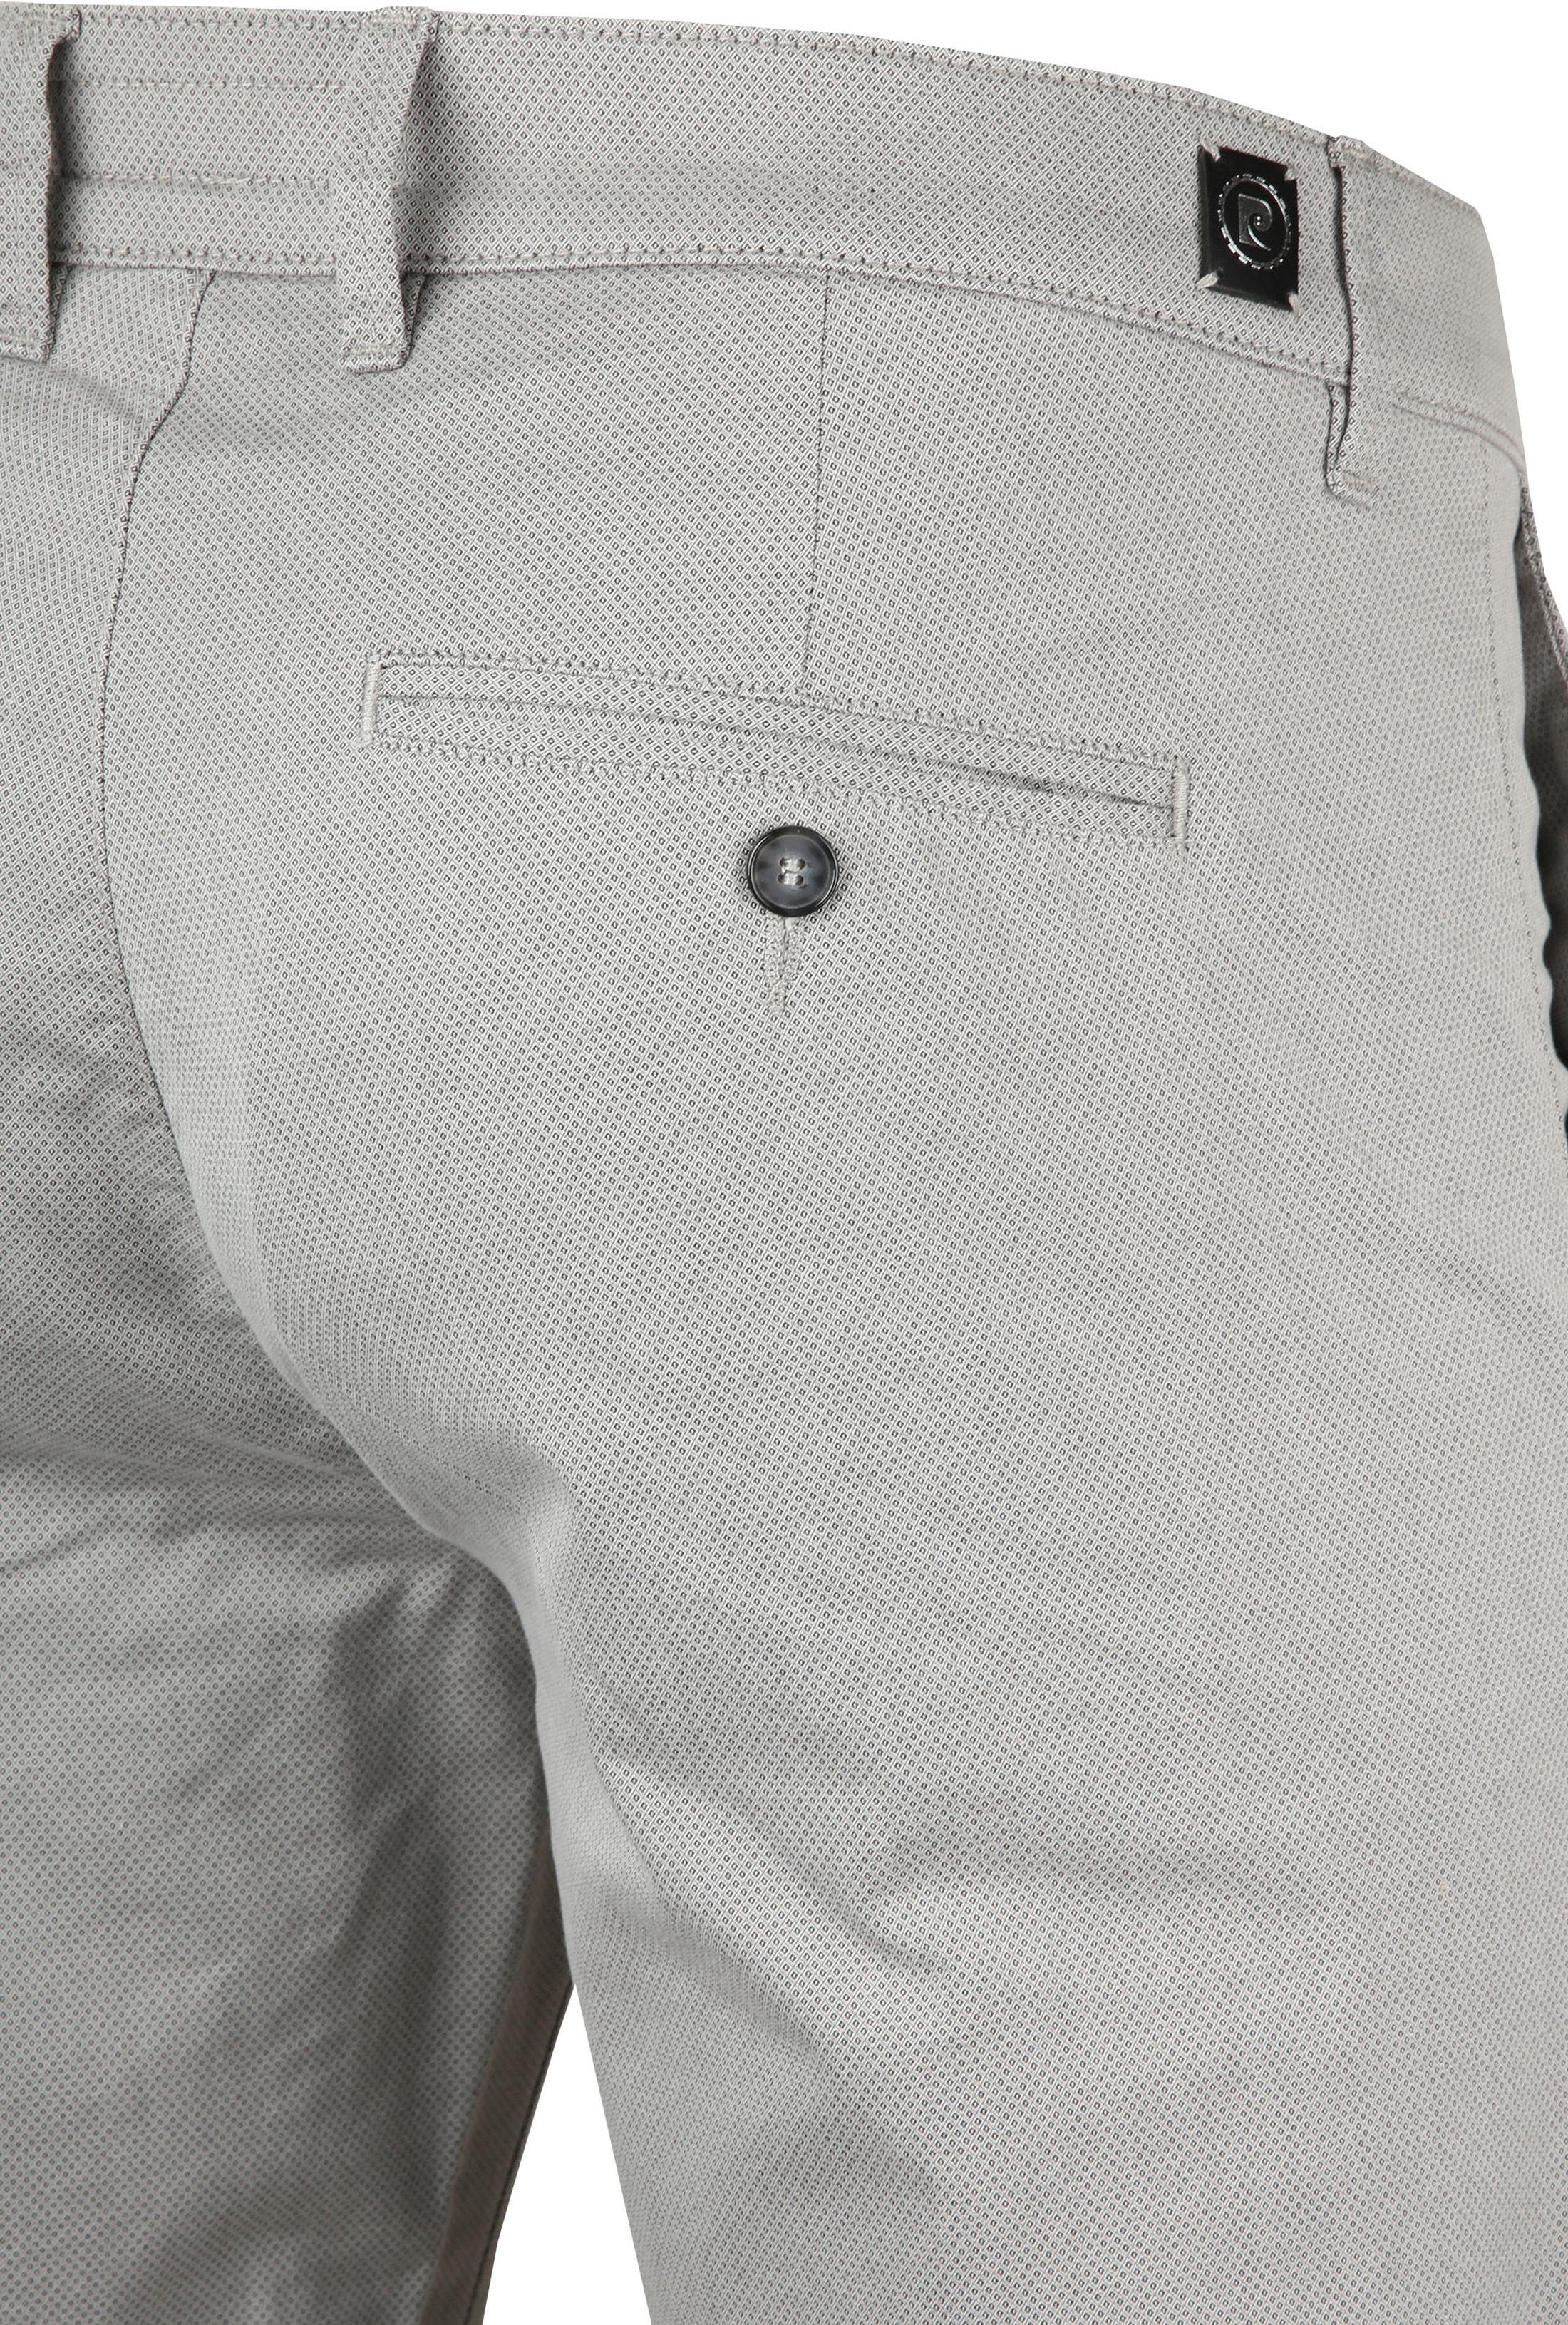 Pierre Cardin Chino Grey foto 1